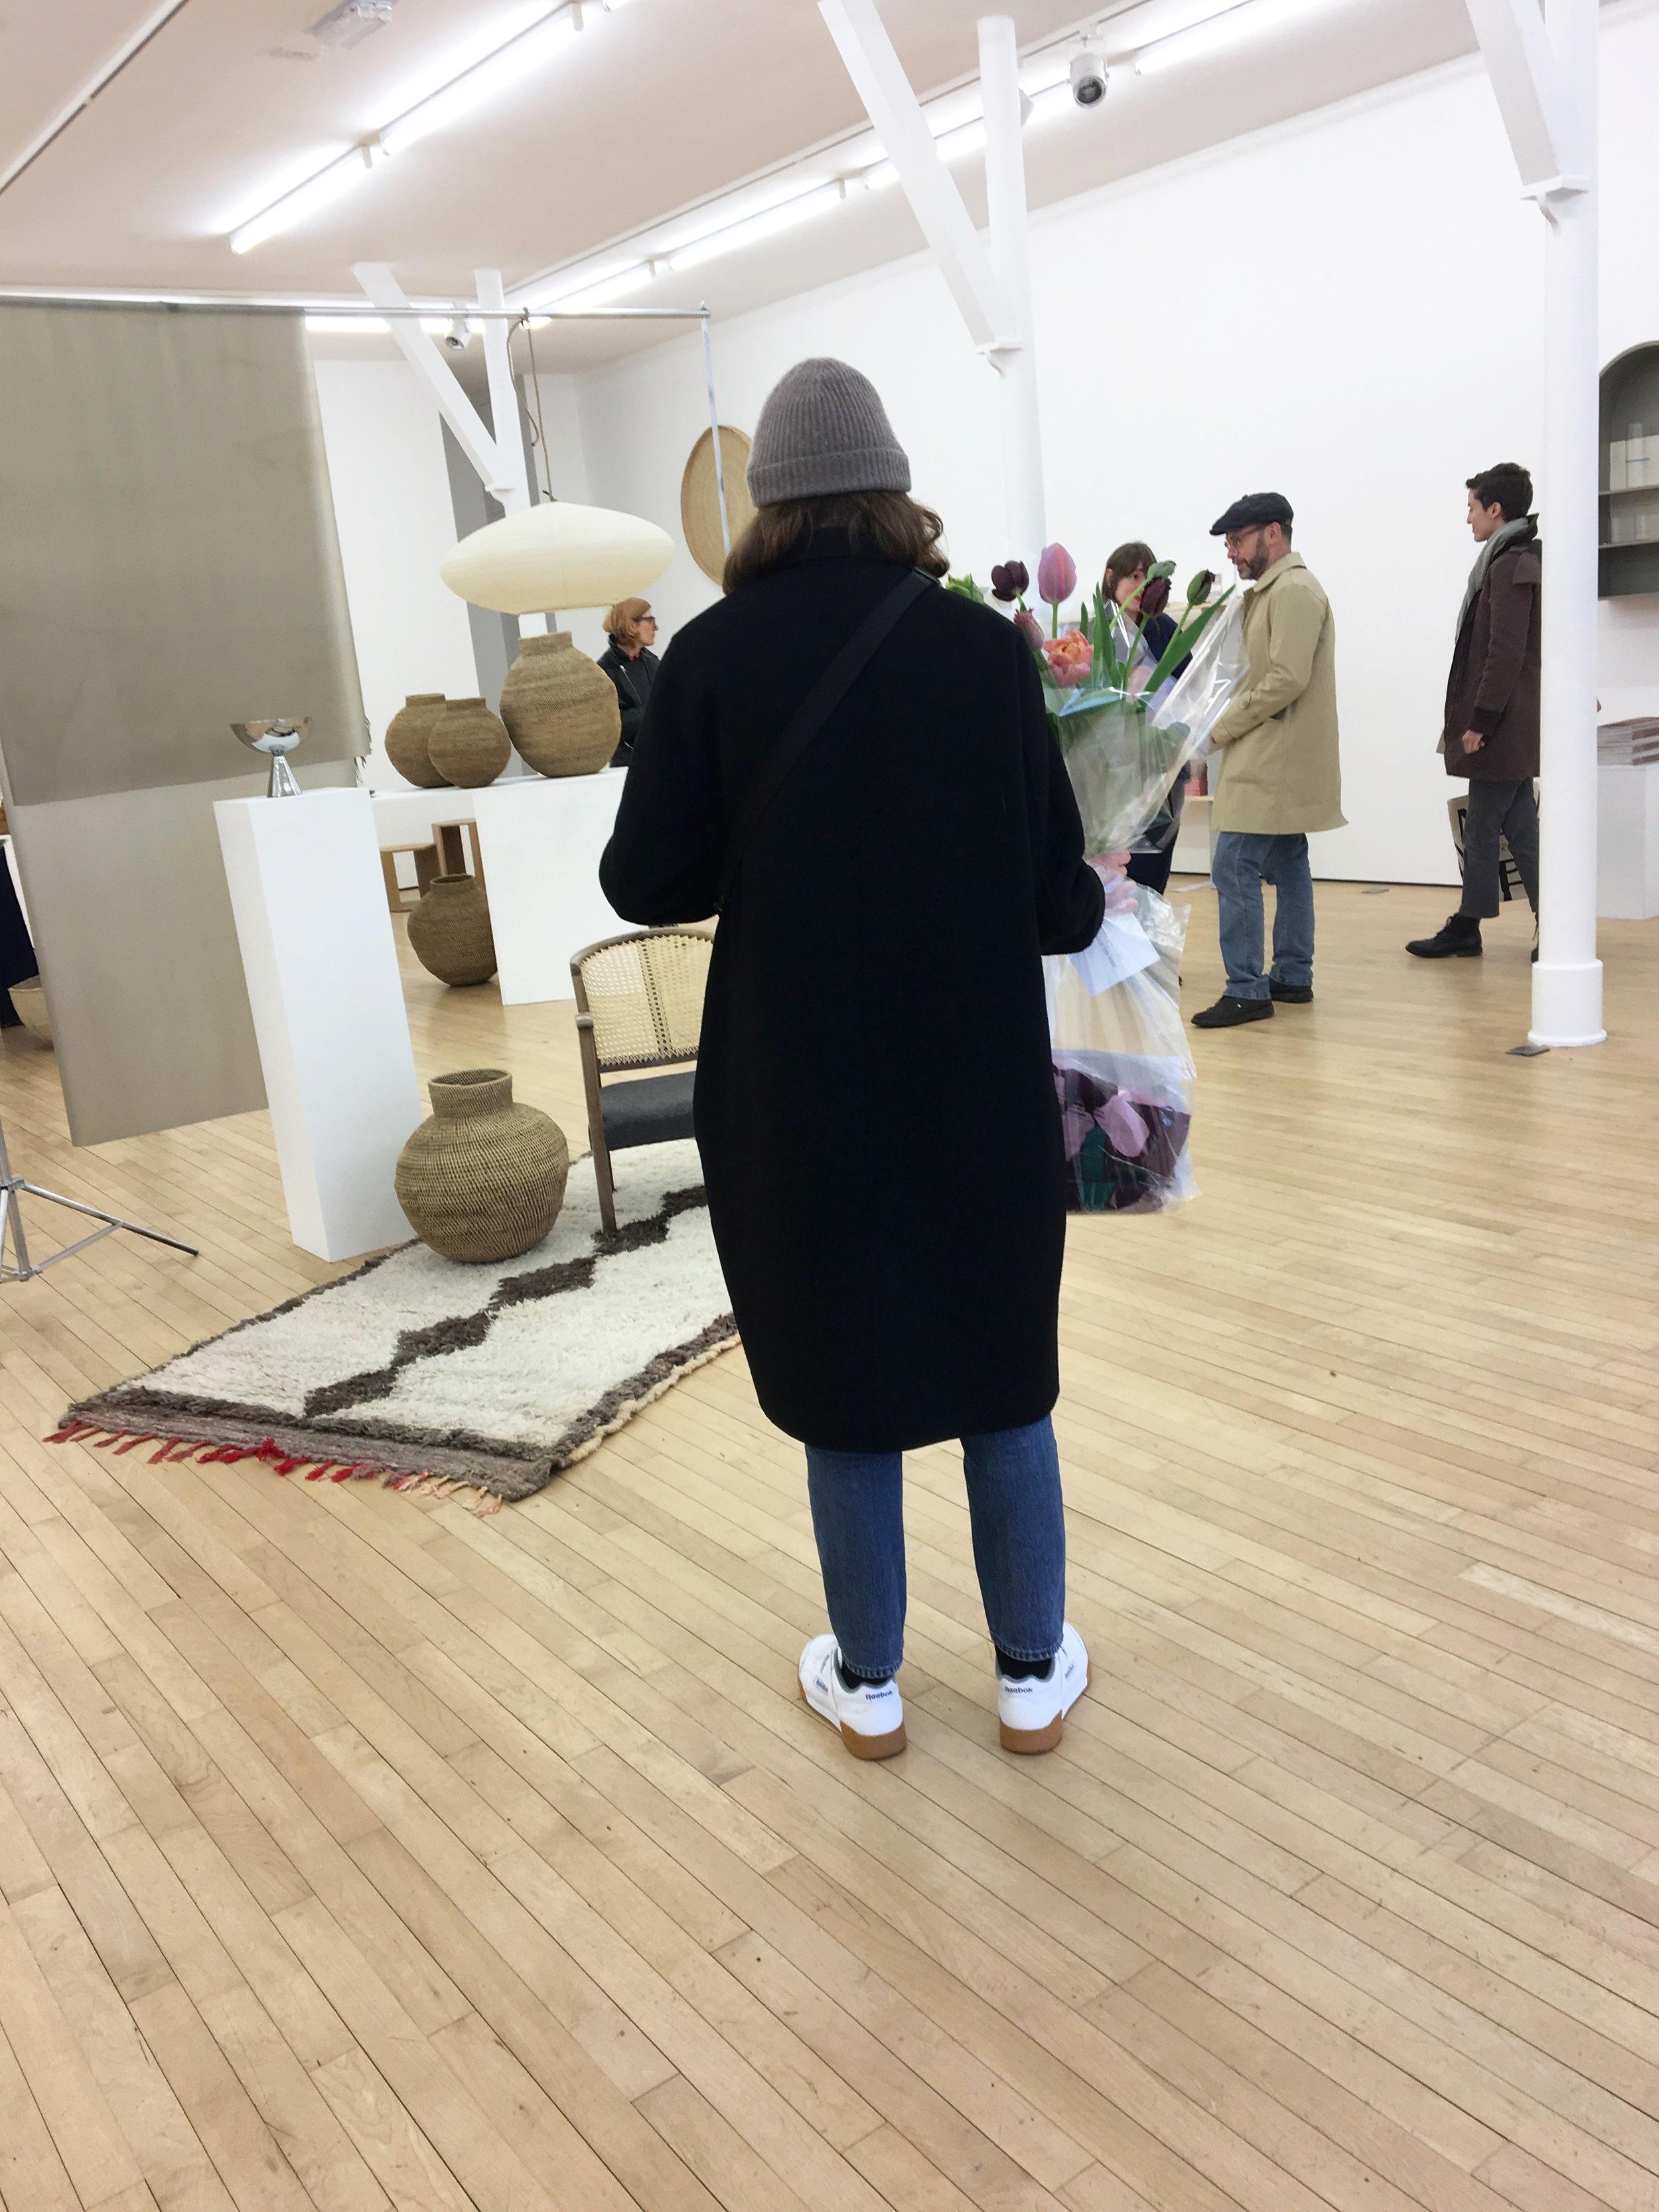 Noguchi Akari 21a pendant,  @celestial_objects ' rug,  @caro.c.wilkinson 's caned chair,  @esradandin 's steel bowl